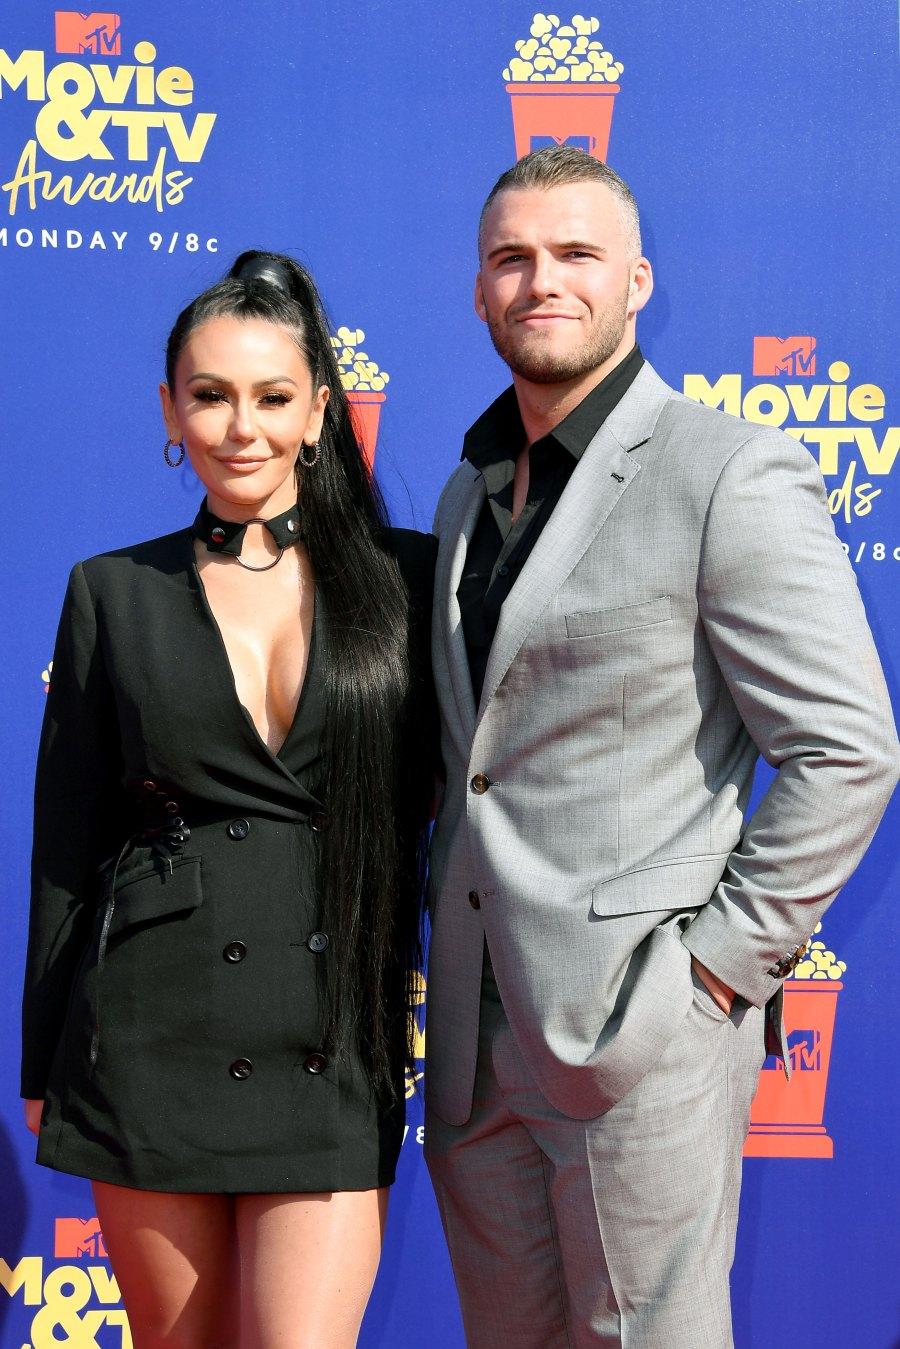 JWoww and BF Zac Make MTV Red Carpet Debut at Movie Awards Jenni Farley and Zack Clayton Carpinello